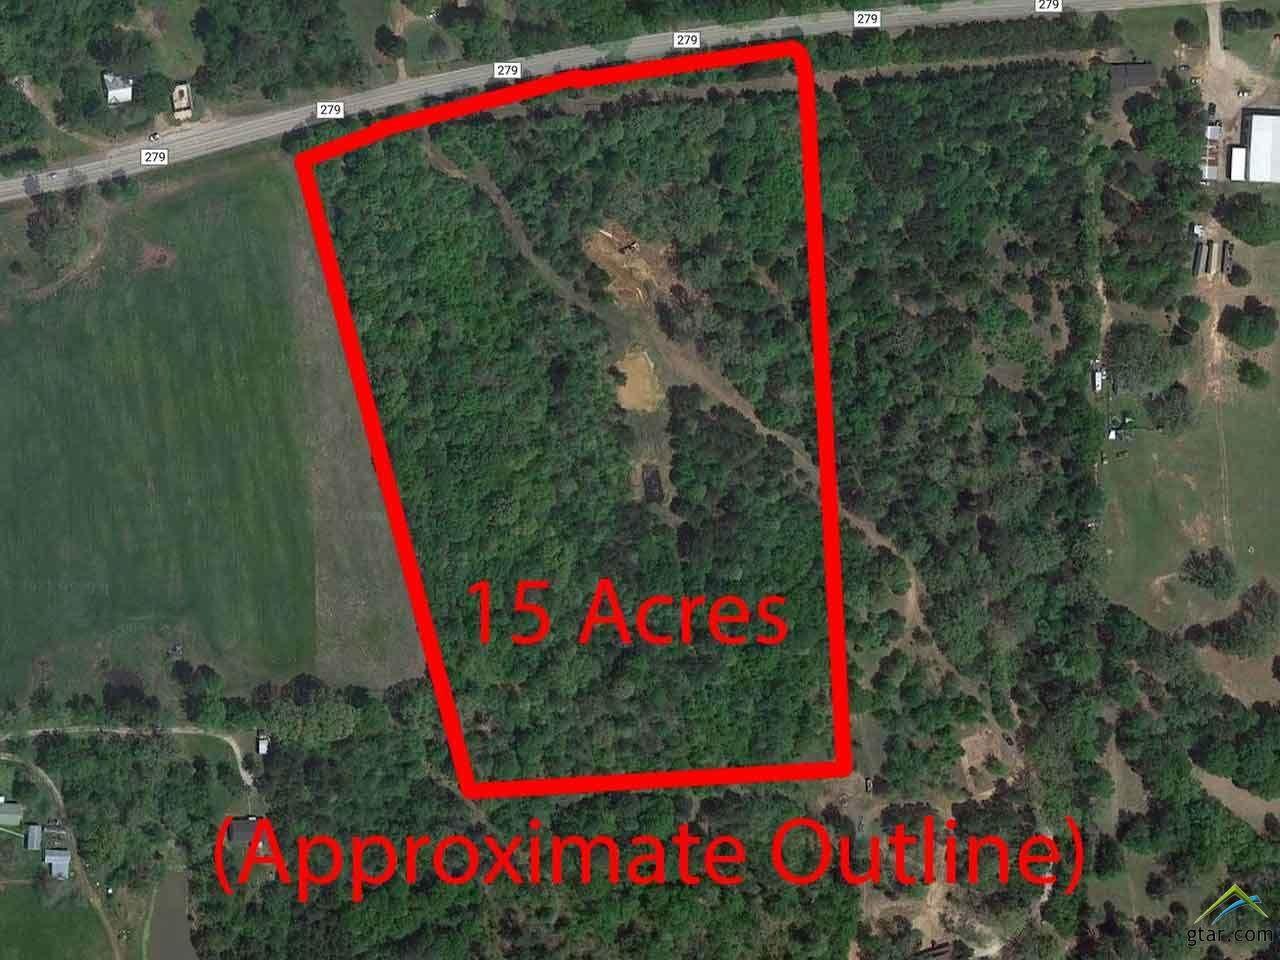 12844 Fm 279, 15 Acres - Photo 1